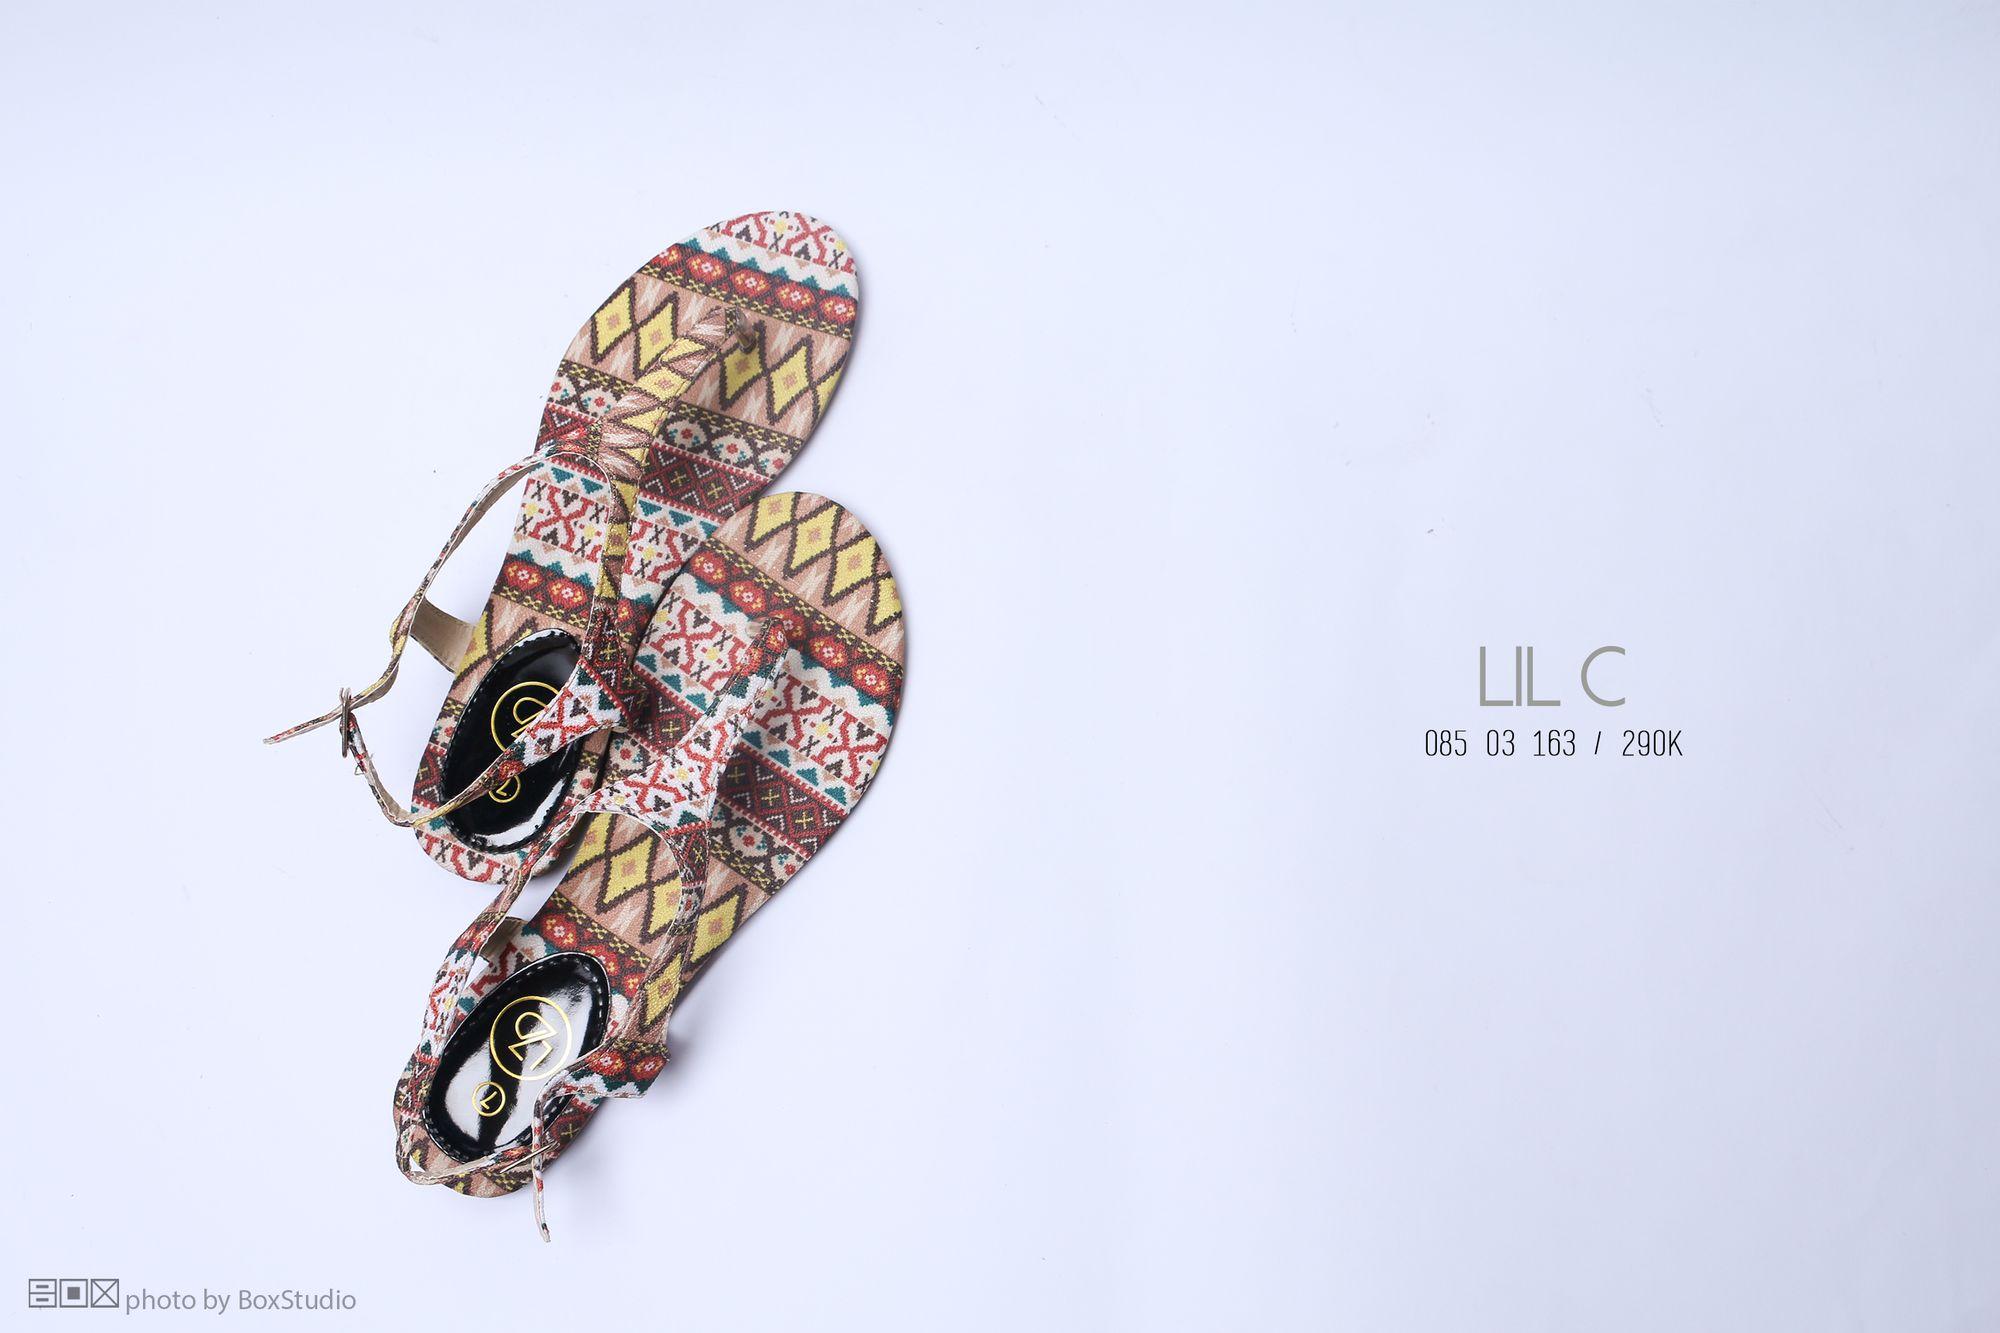 box-visual_chup-san-pham-voi-phan-khong-gian-trong_giay-sandal